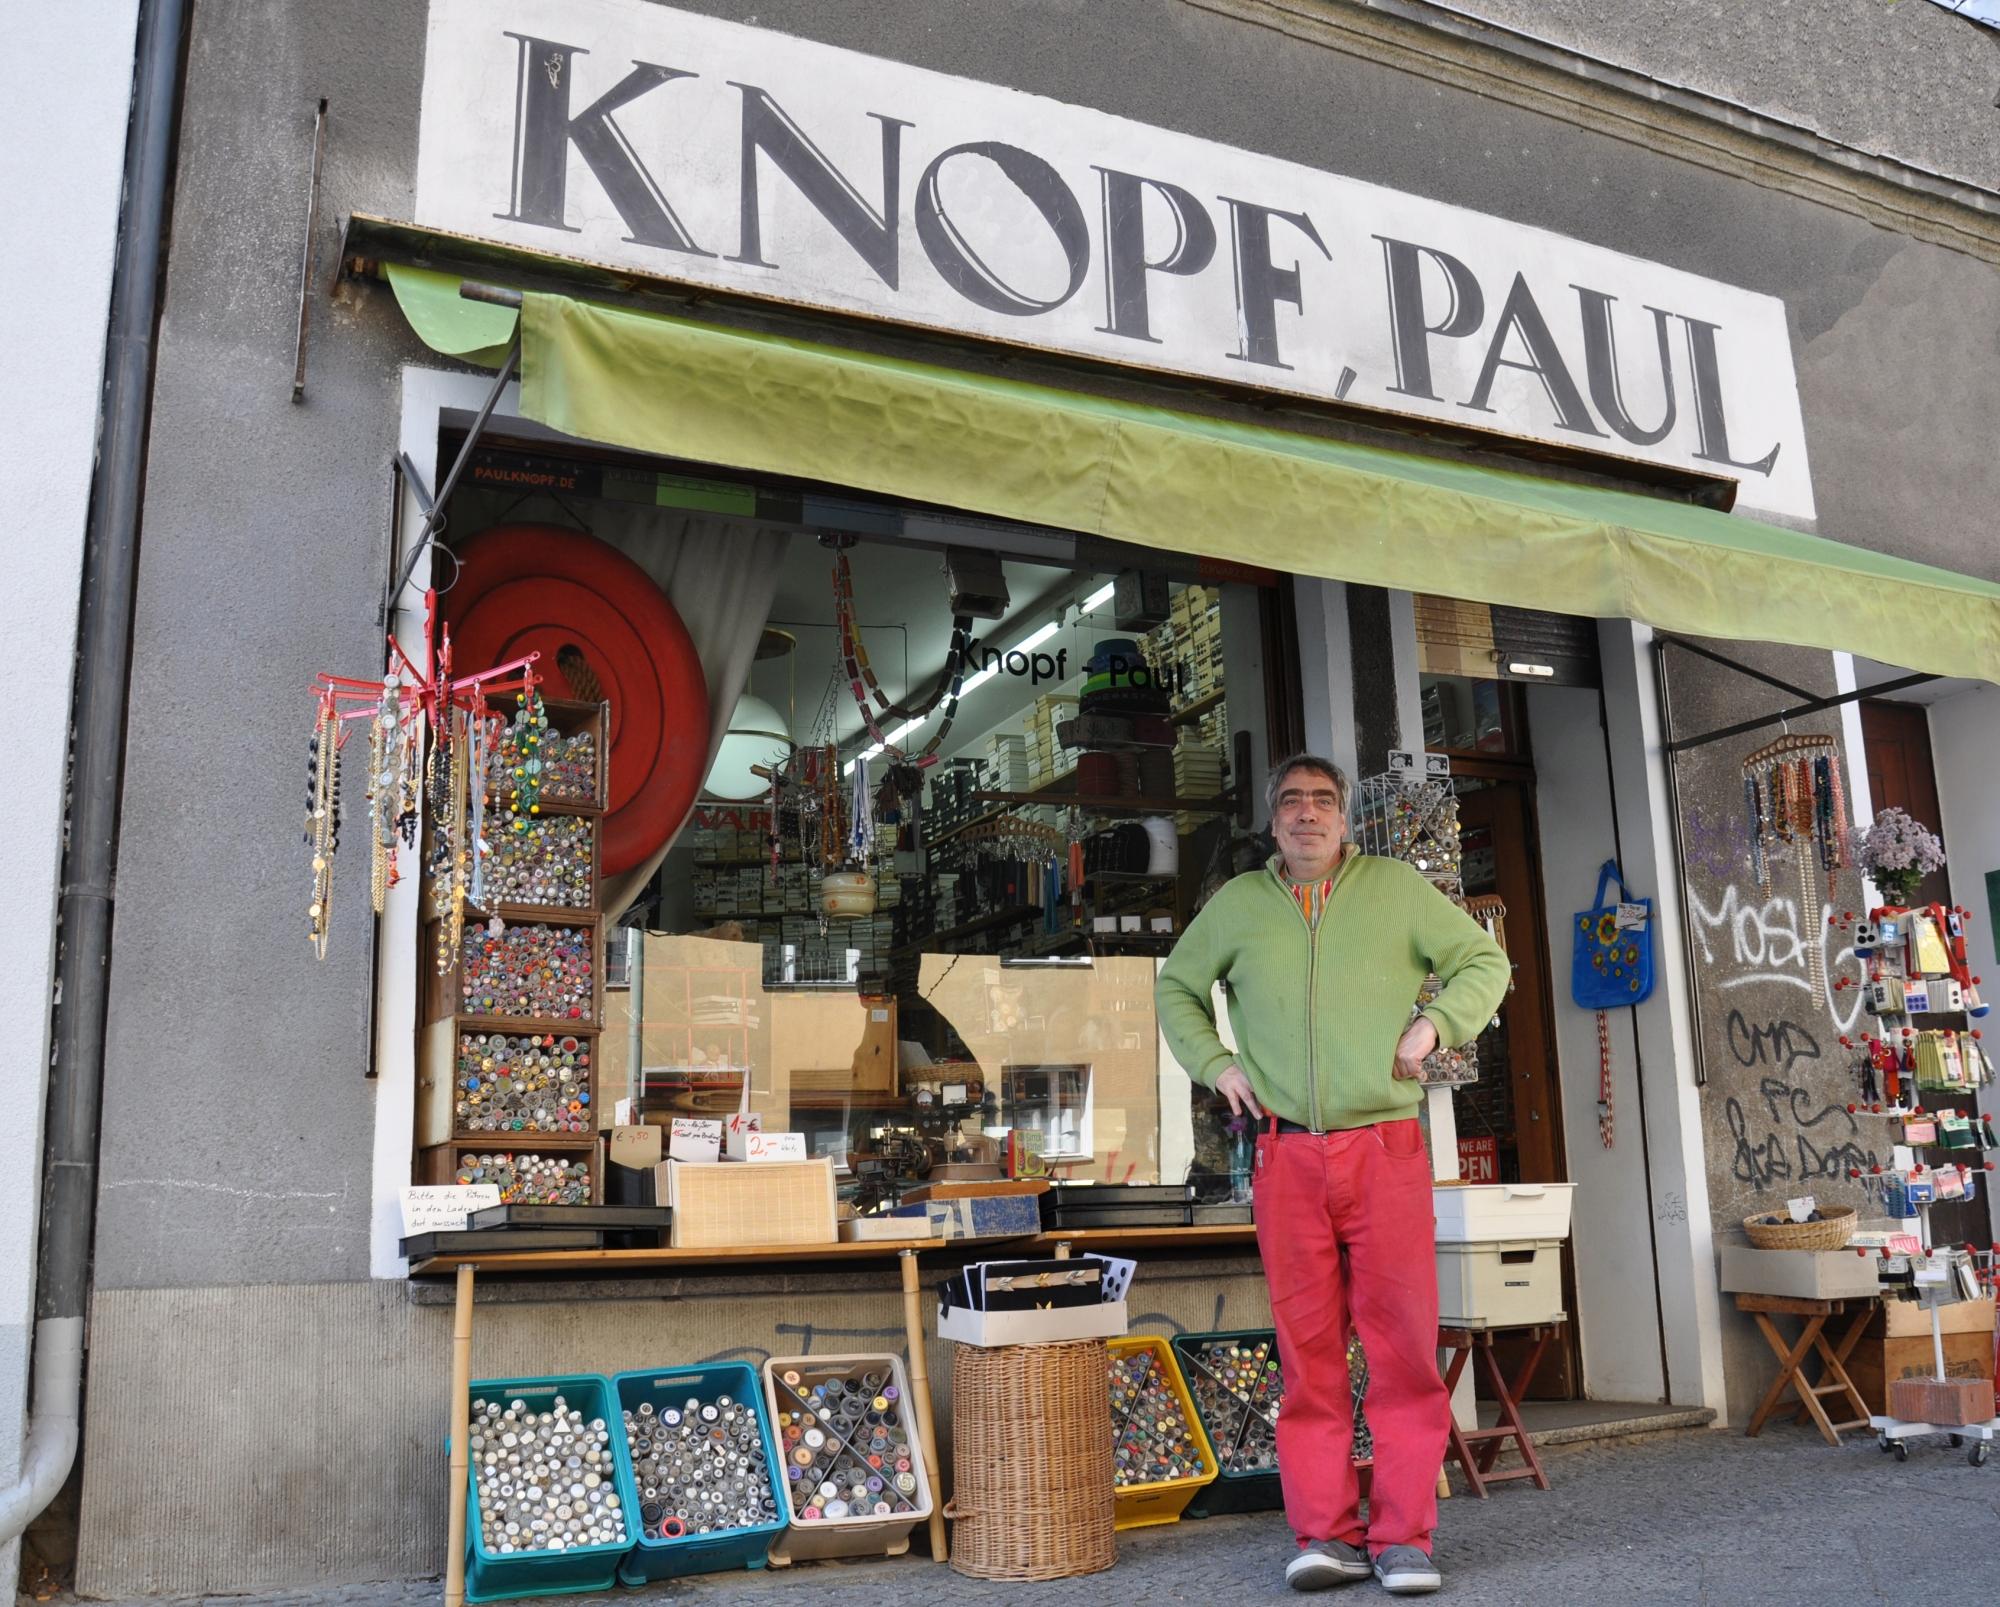 Knopf.jpg